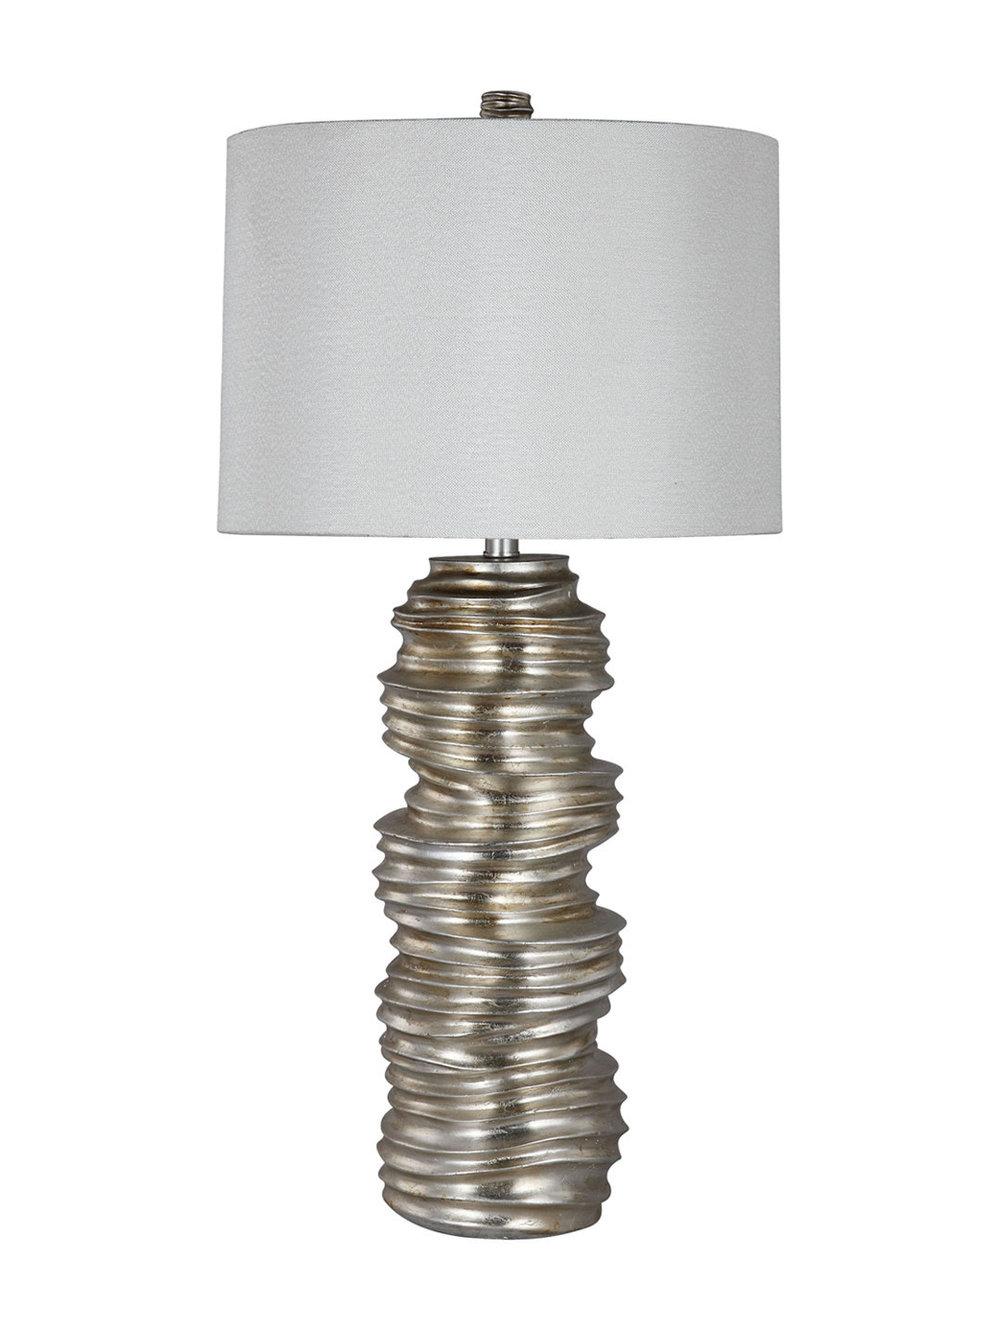 Design Board Living Jungle Lamp.jpg